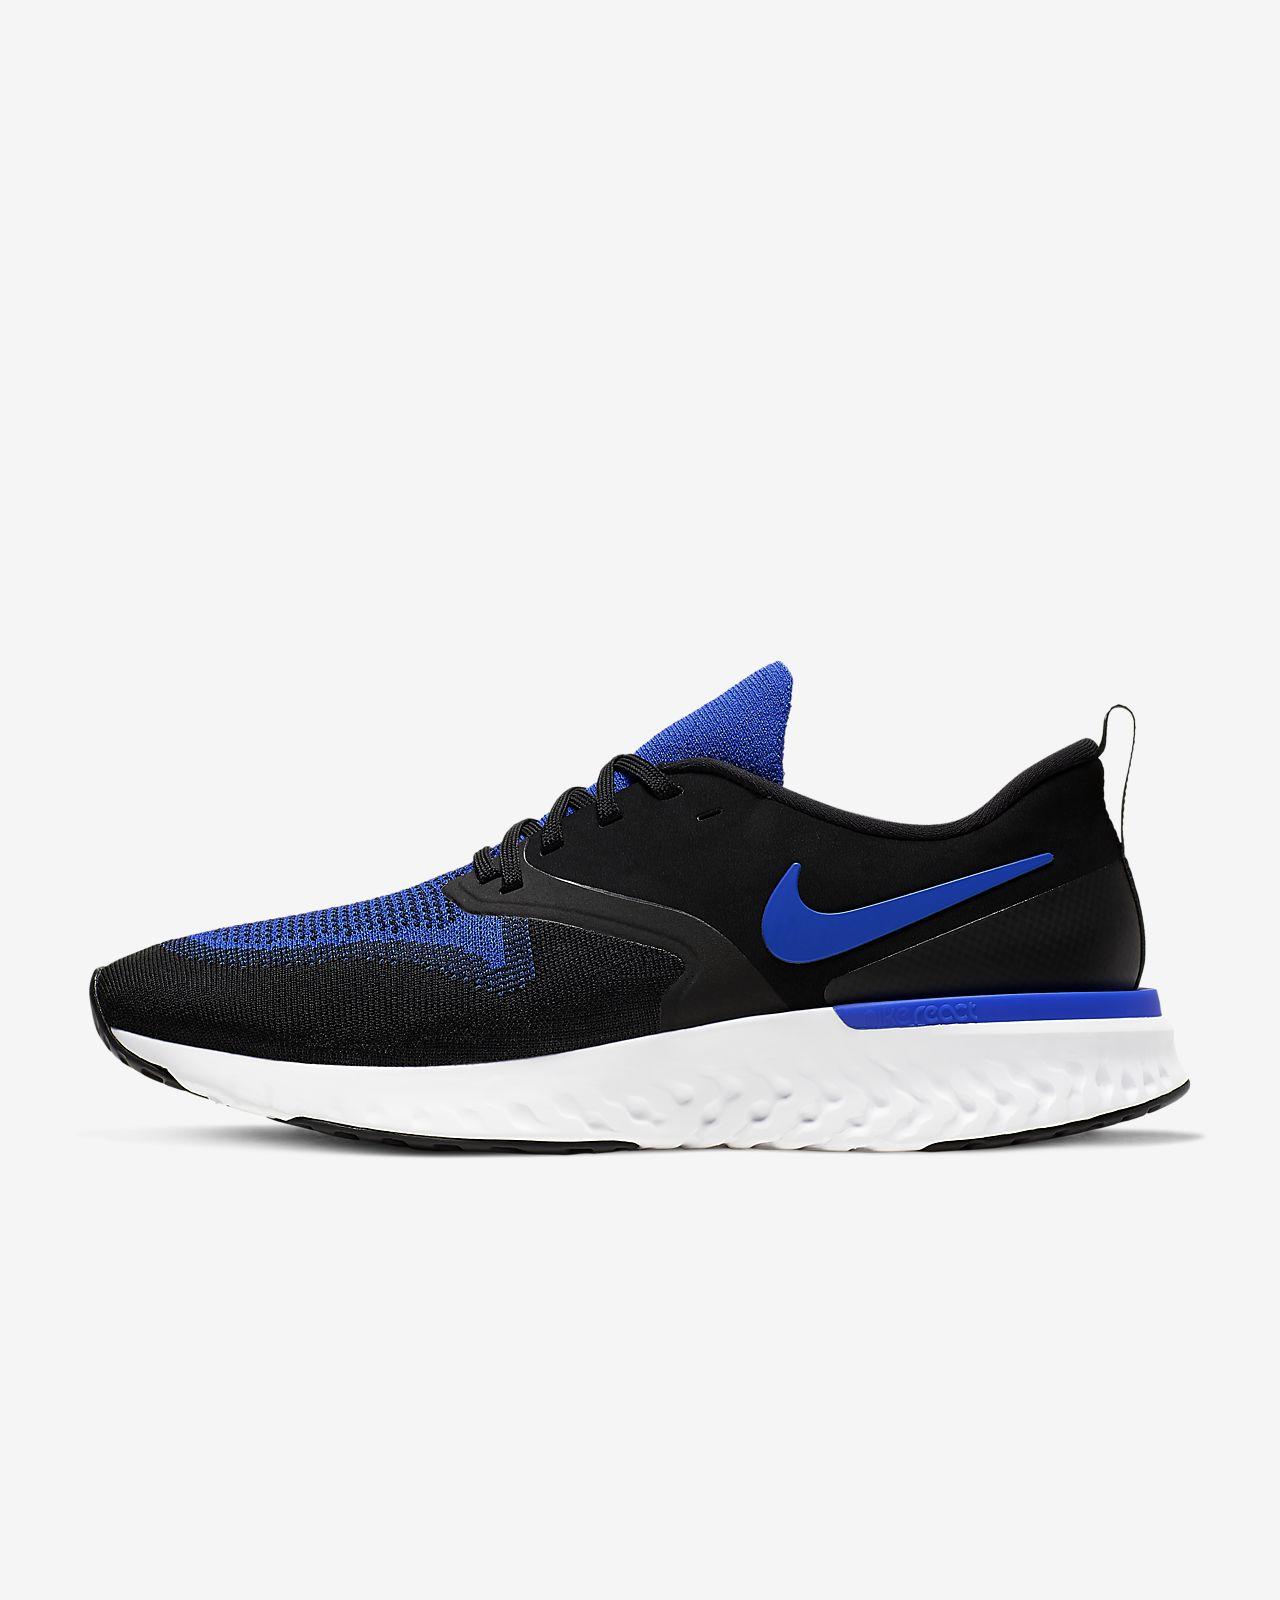 Nike Odyssey React Flyknit 2 Herren-Laufschuh